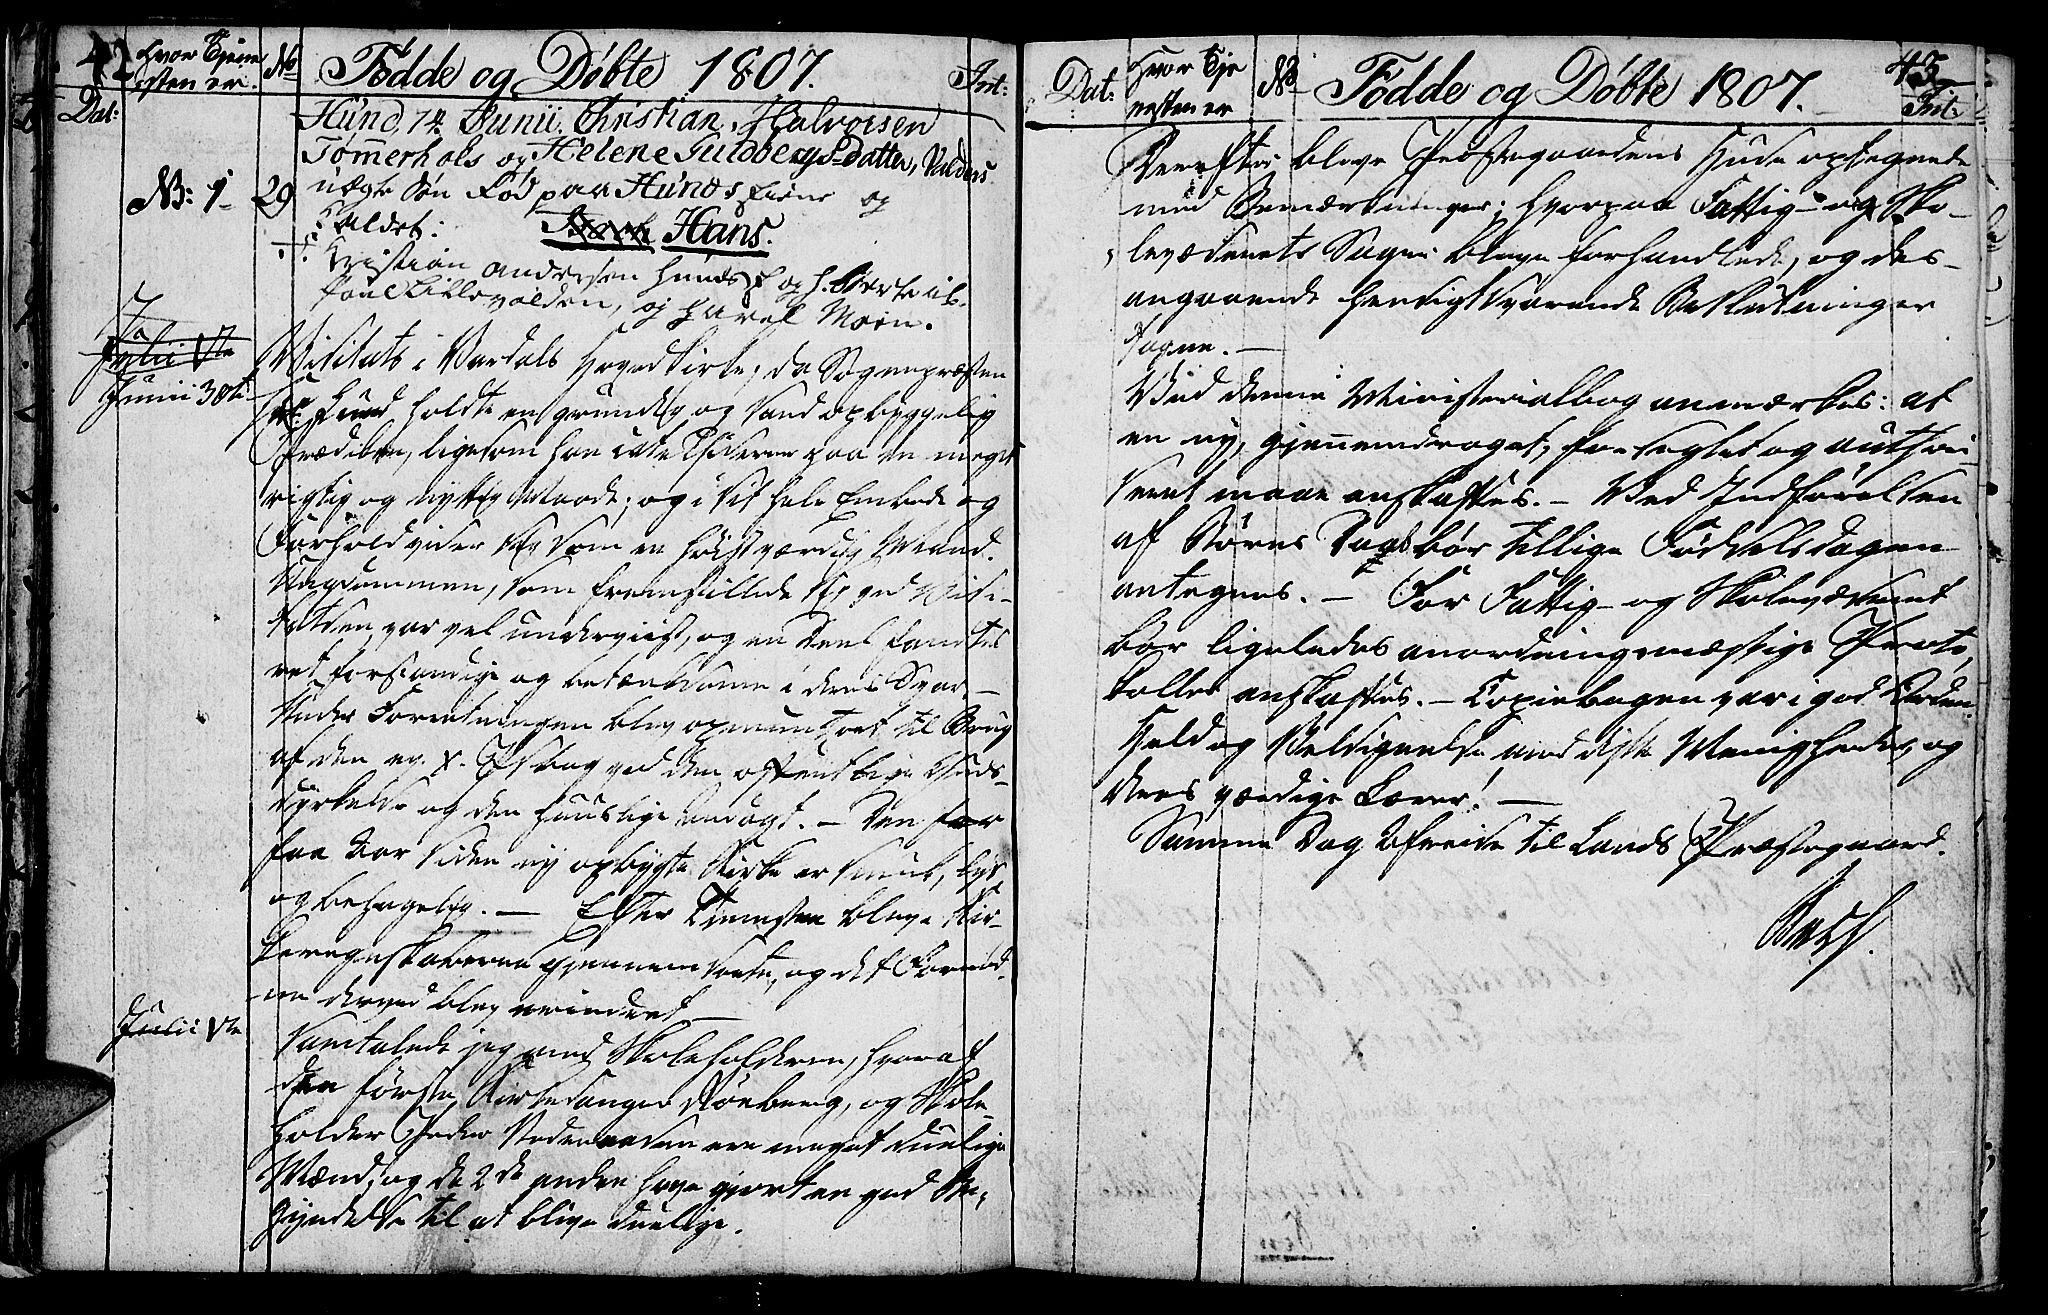 SAH, Vardal prestekontor, H/Ha/Hab/L0003: Klokkerbok nr. 3, 1803-1808, s. 42-43